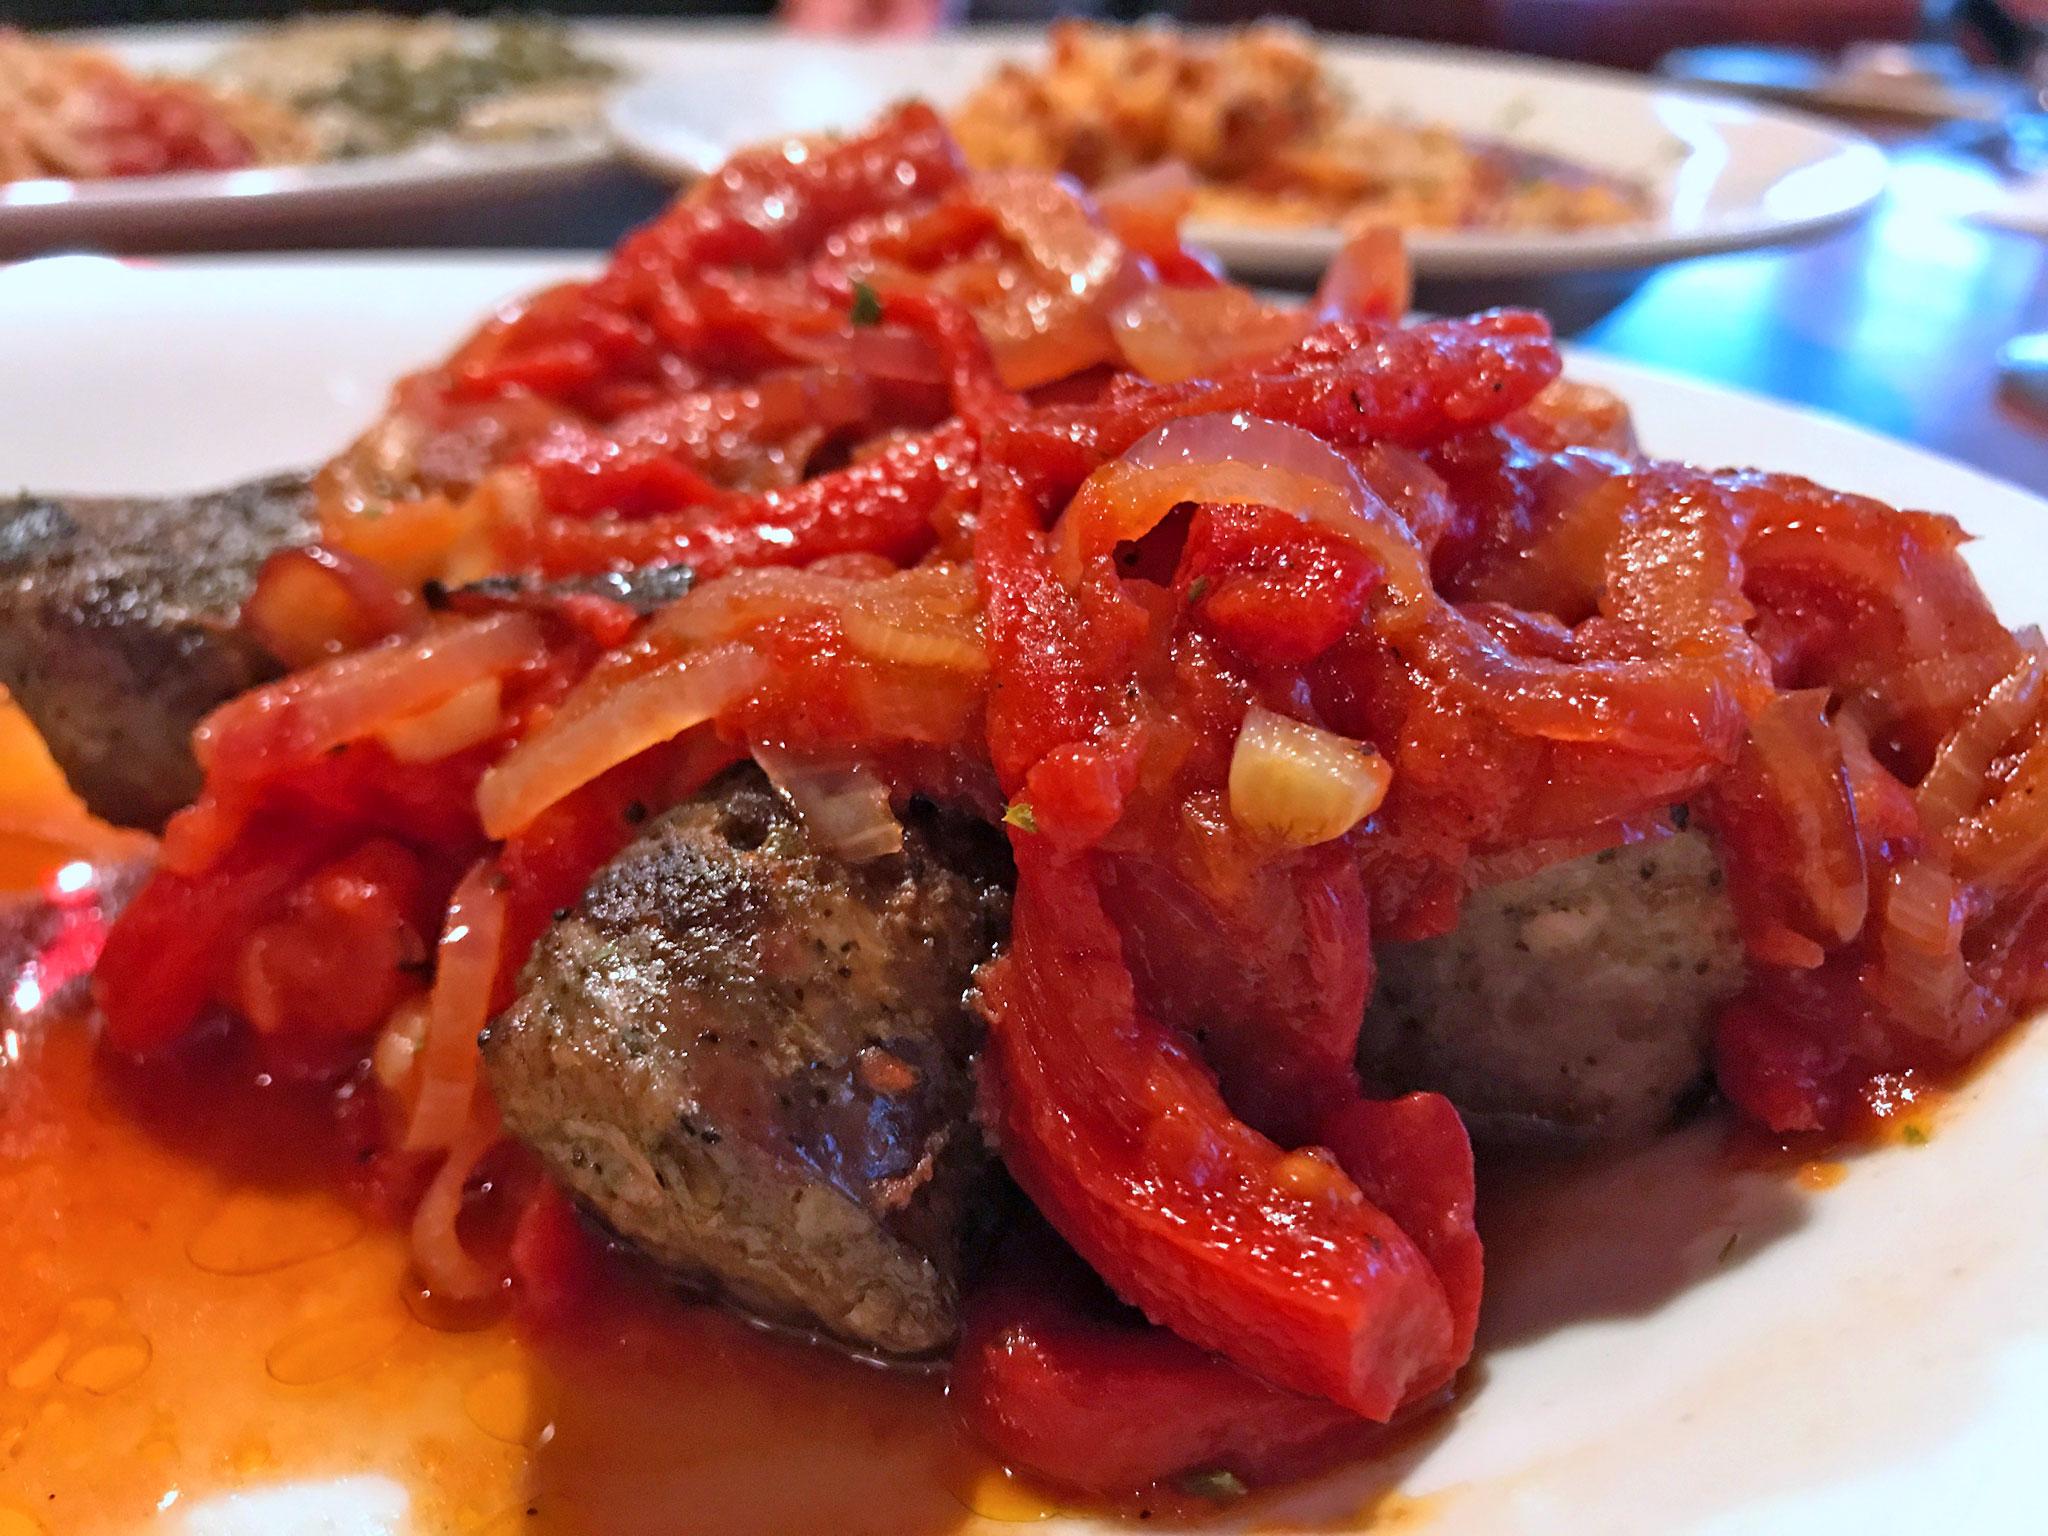 Italian Sausage (Sausage & Peppers) at Cafe Cibo